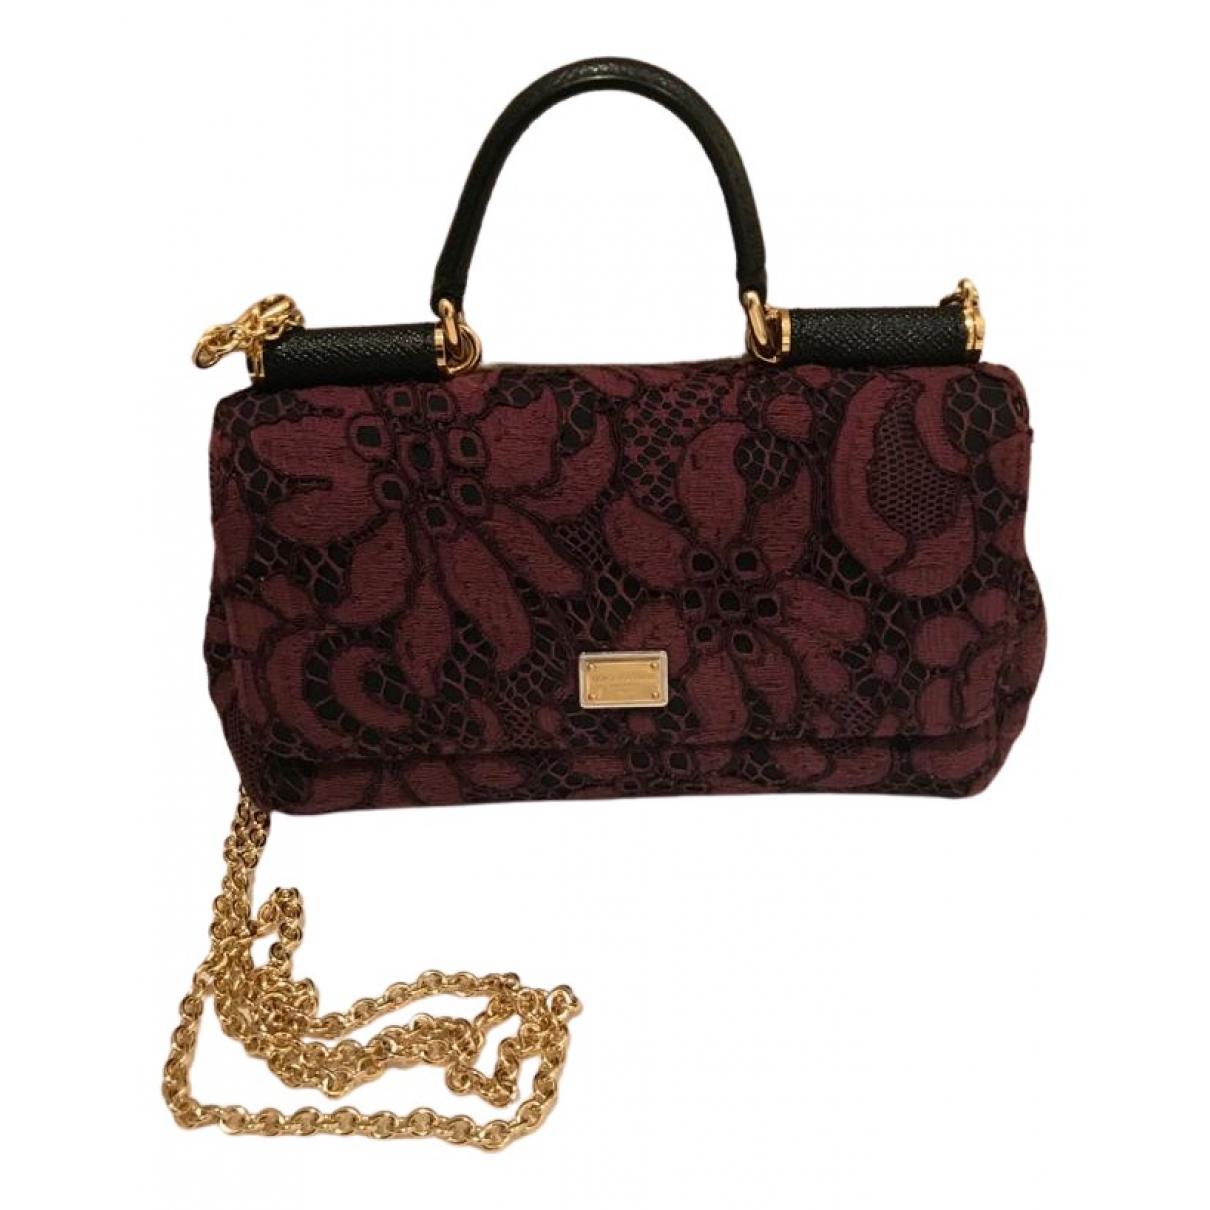 Dolce & Gabbana Sicily Purple Cloth handbag for Women \N